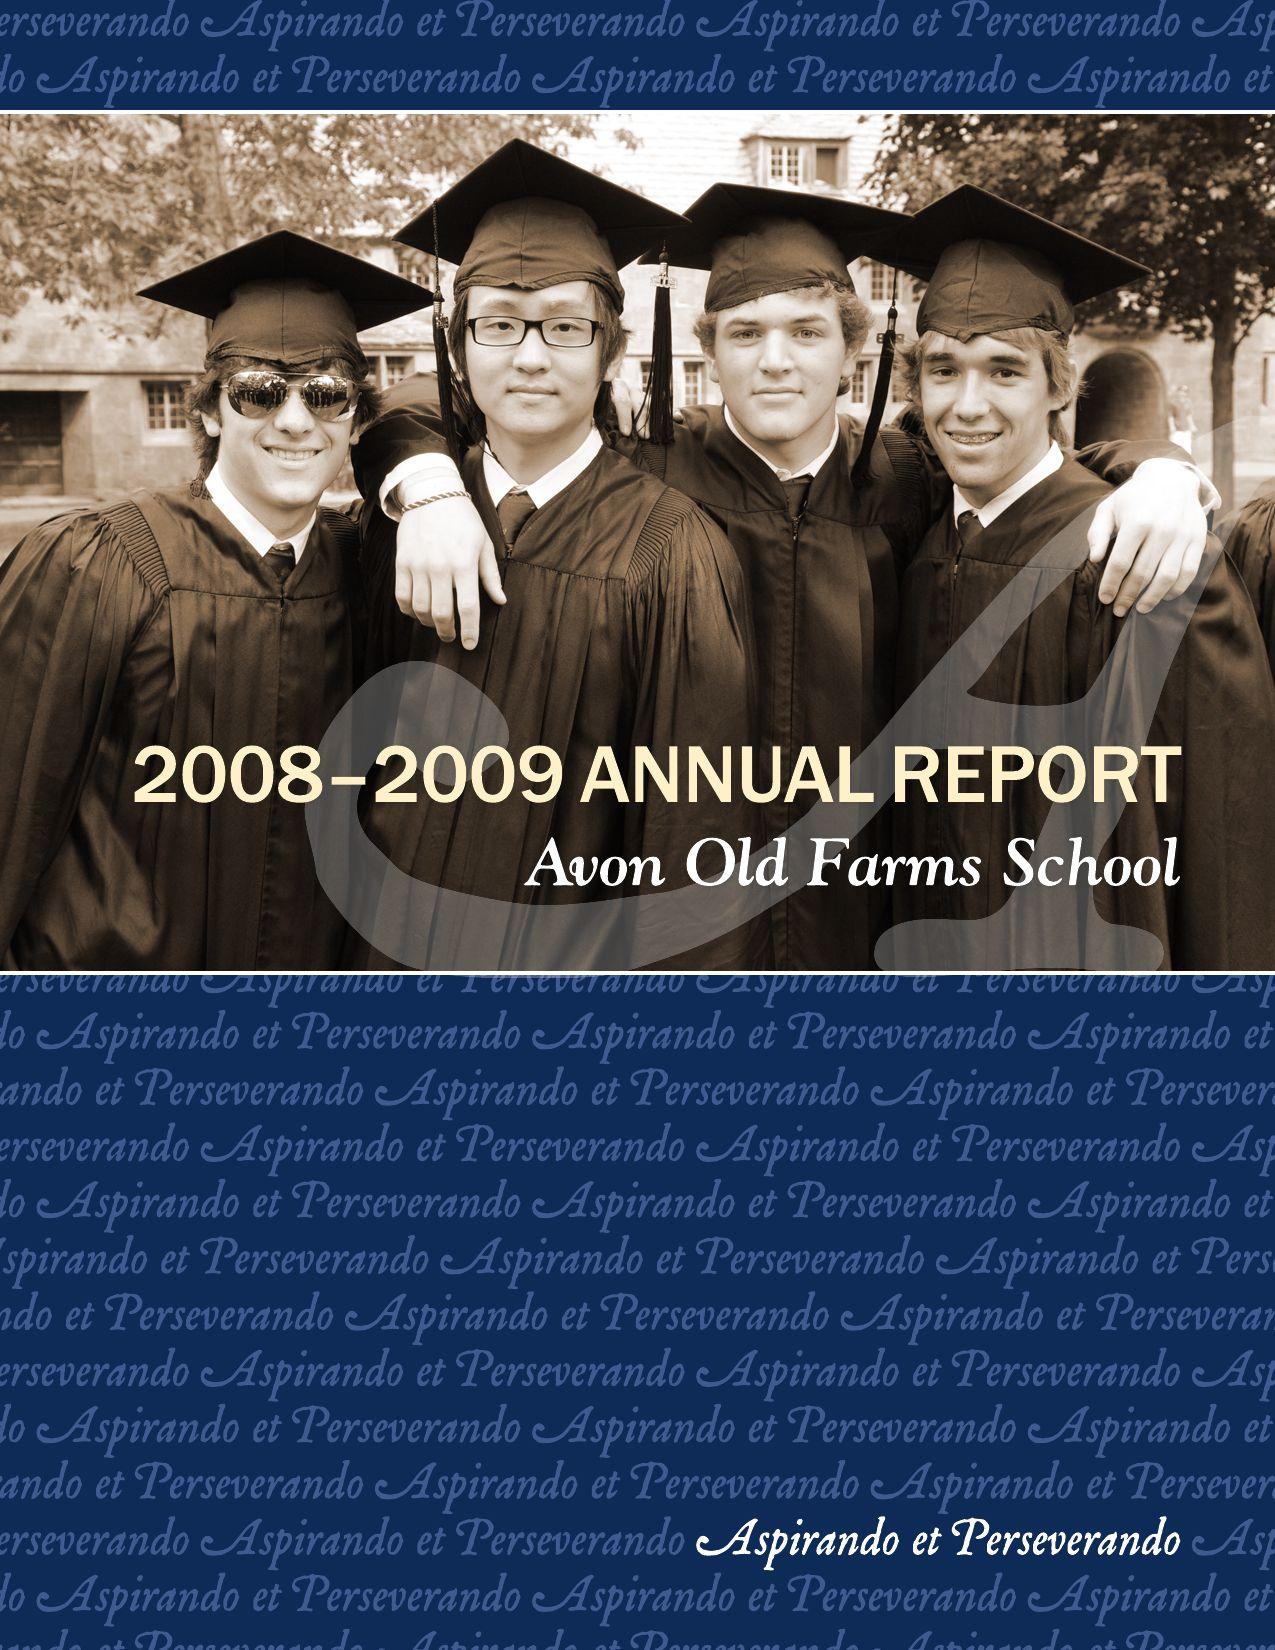 annualreportfinal by marissa gagnon issuu 2008 09 annual report